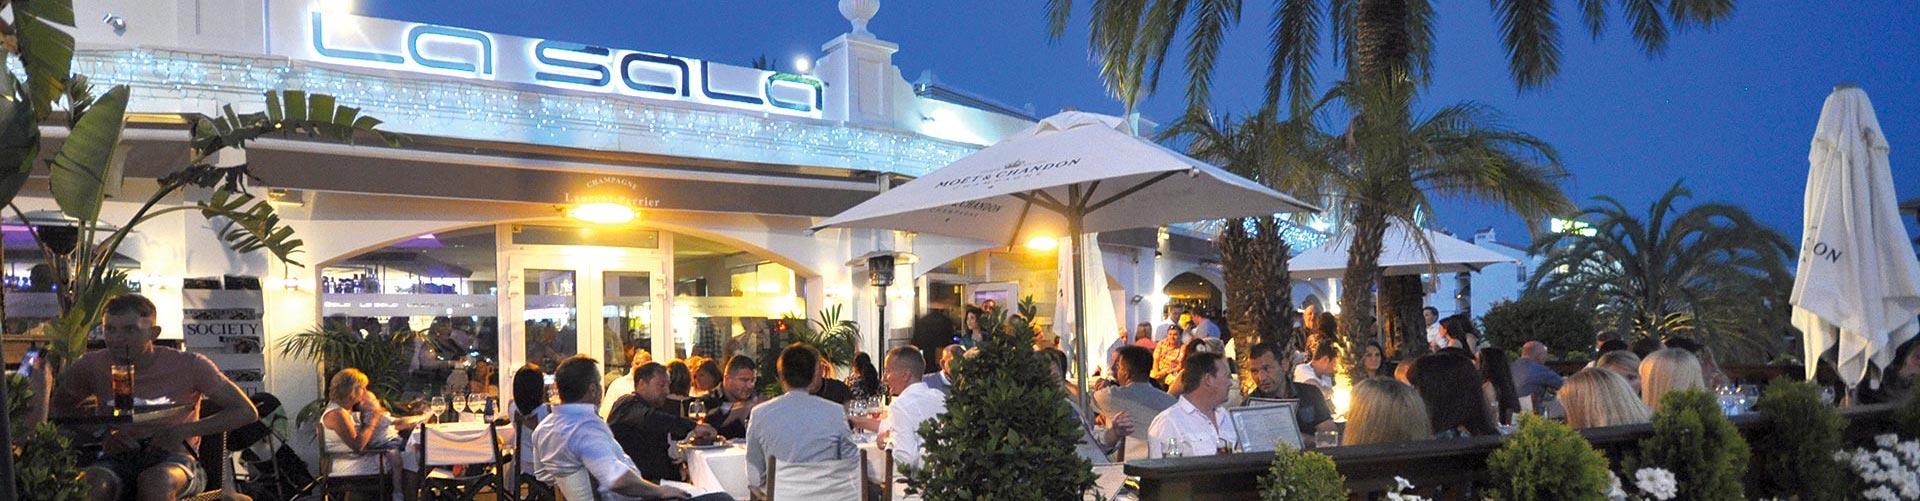 la sala located on calle belmonte road in puerto banus